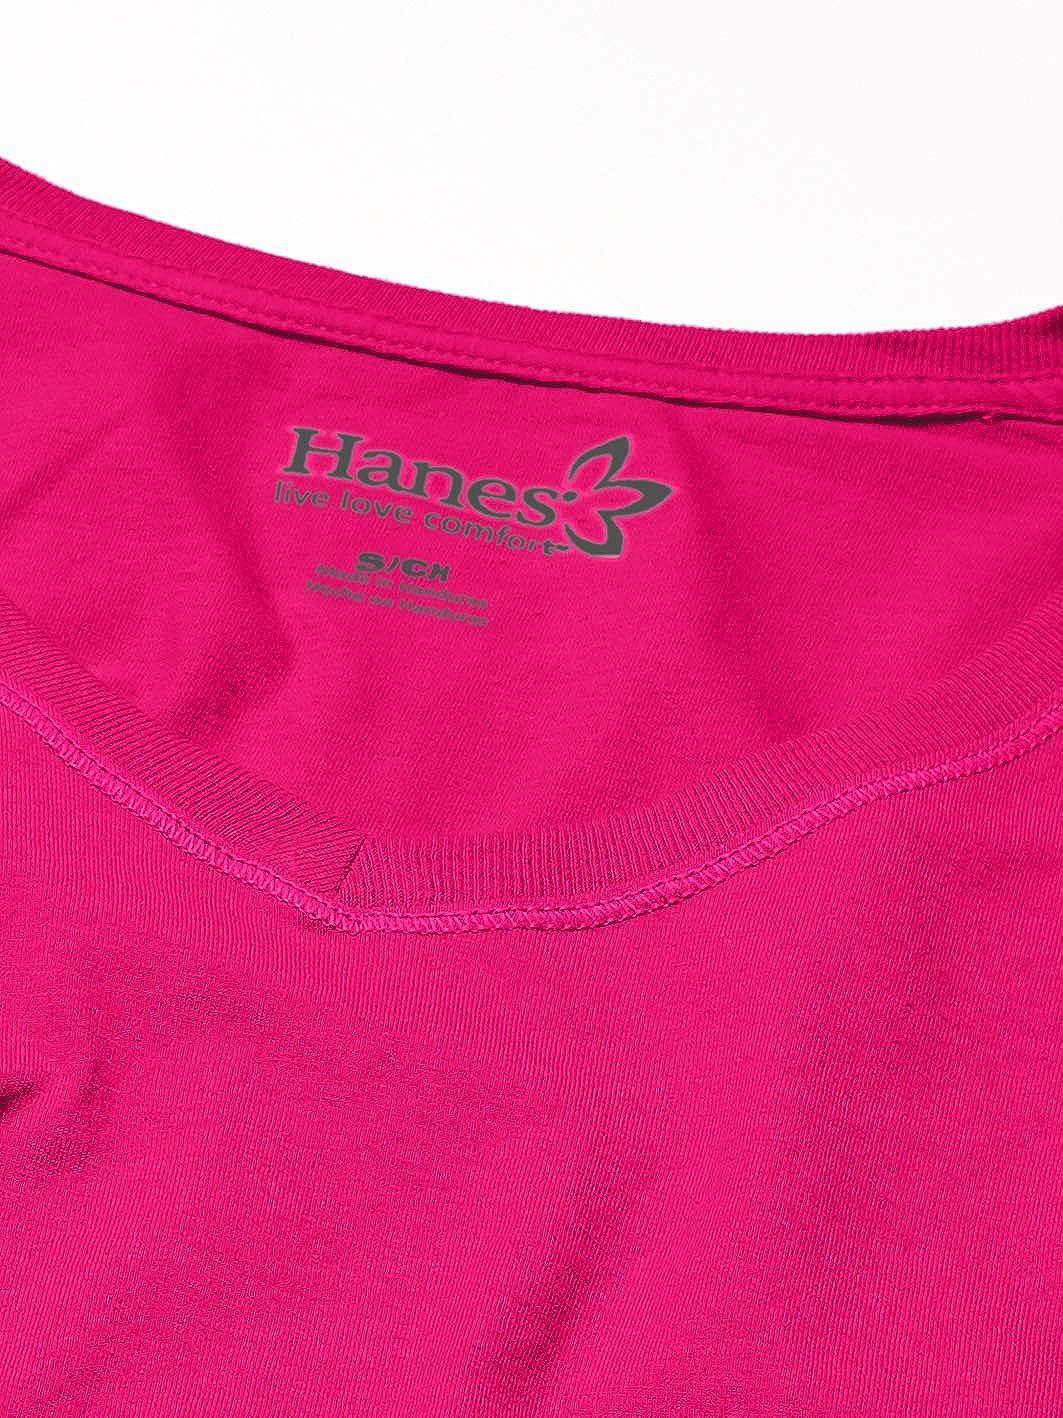 Hanes Womens V-Neck Long Sleeve Tee